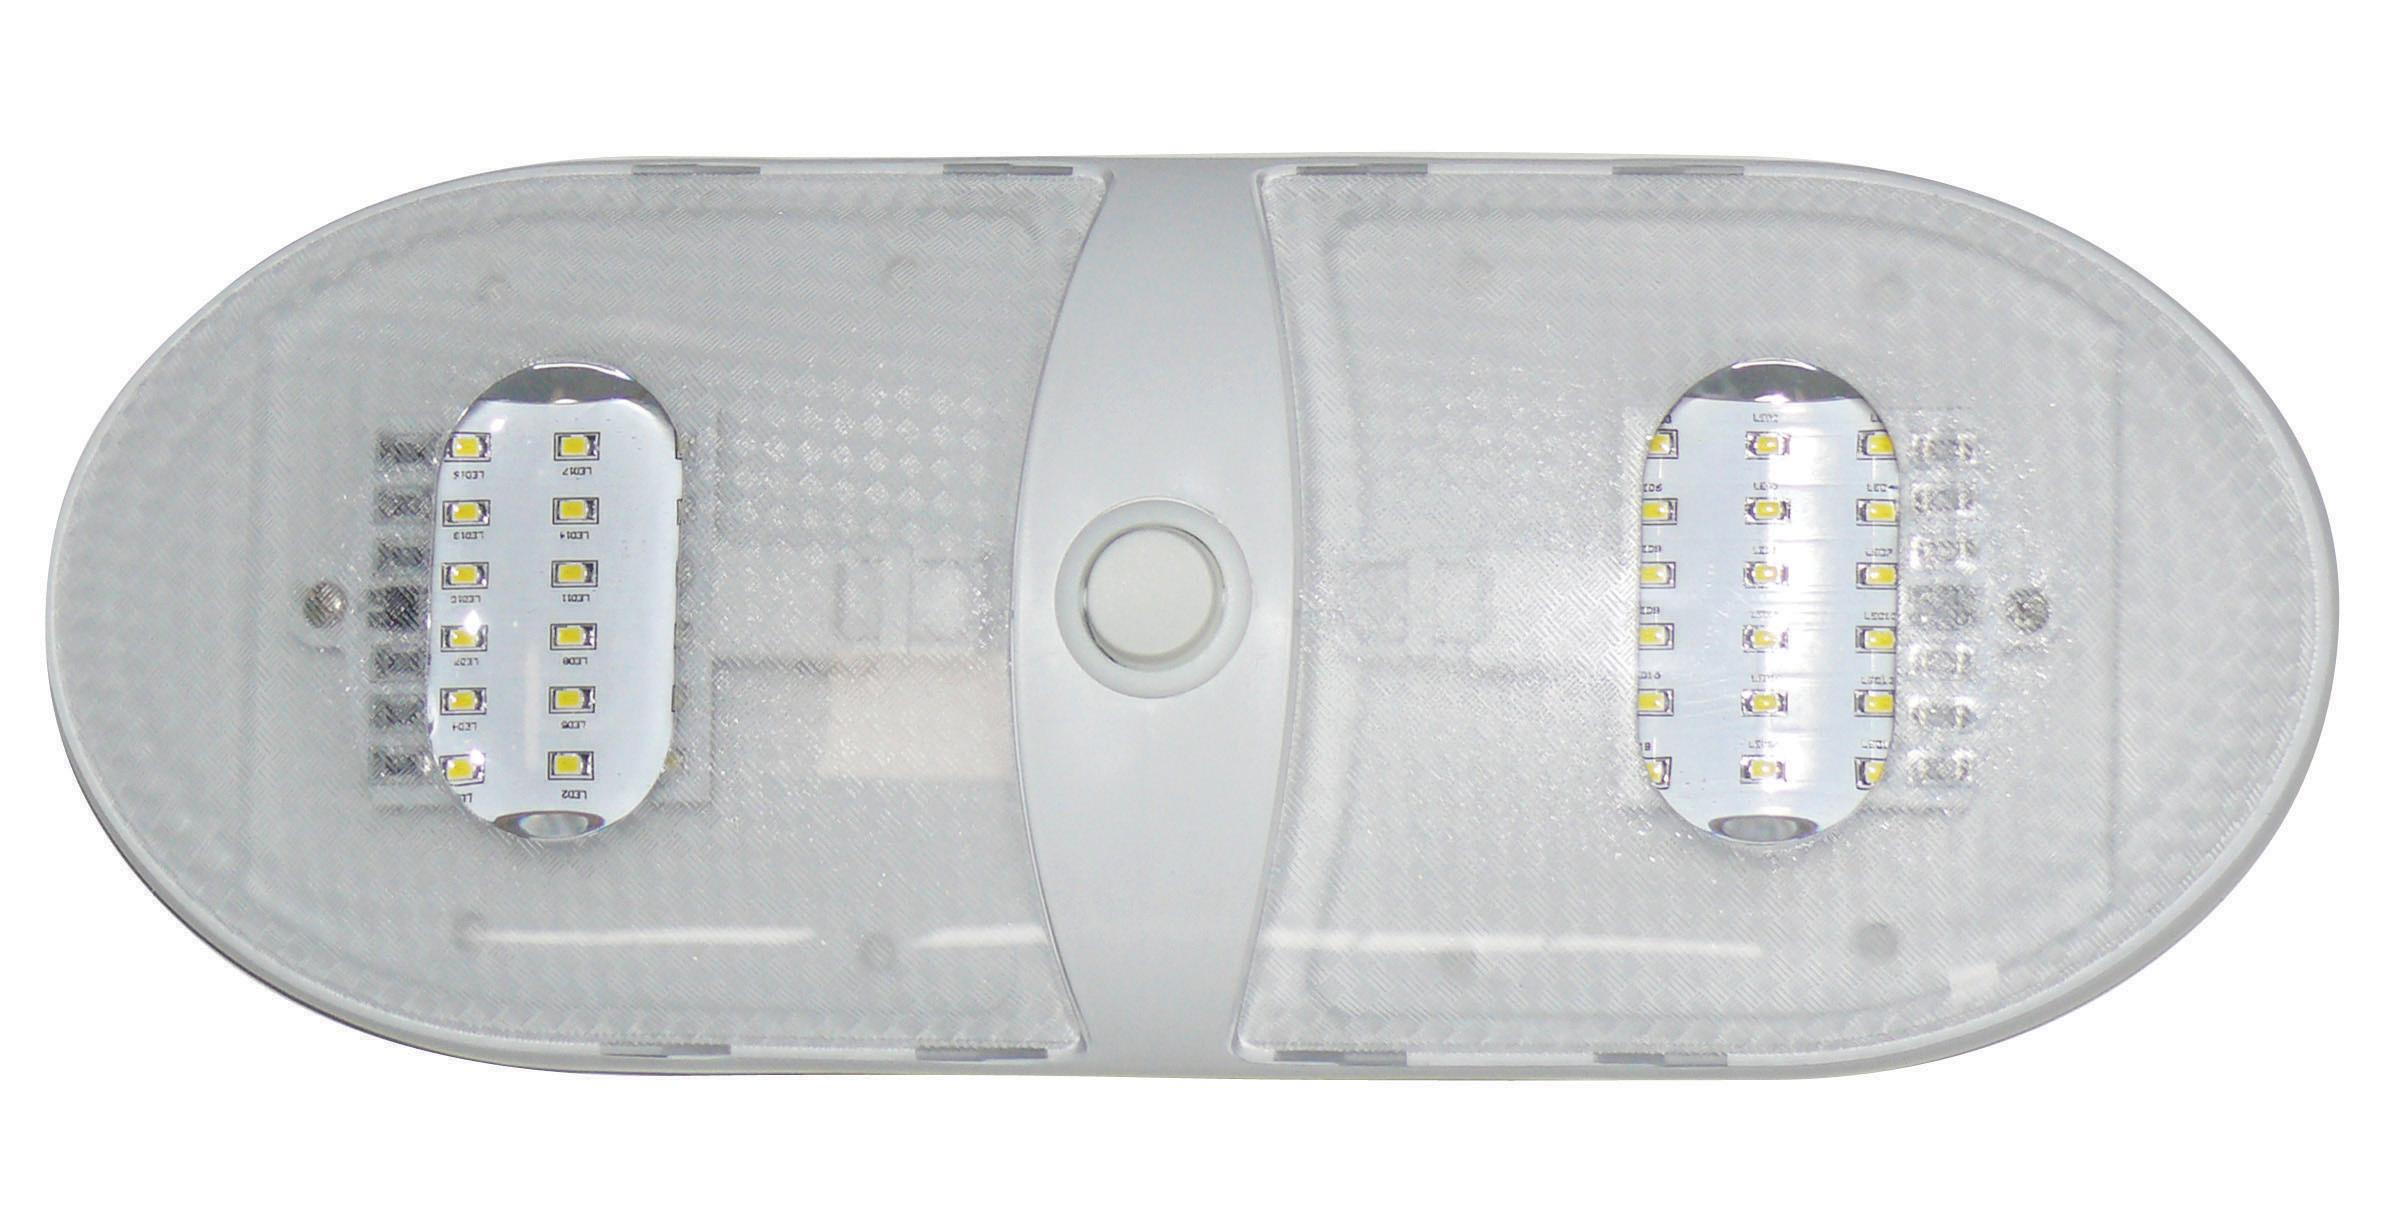 Slim Line Double LED Dome Light - Warm White 65430-ww